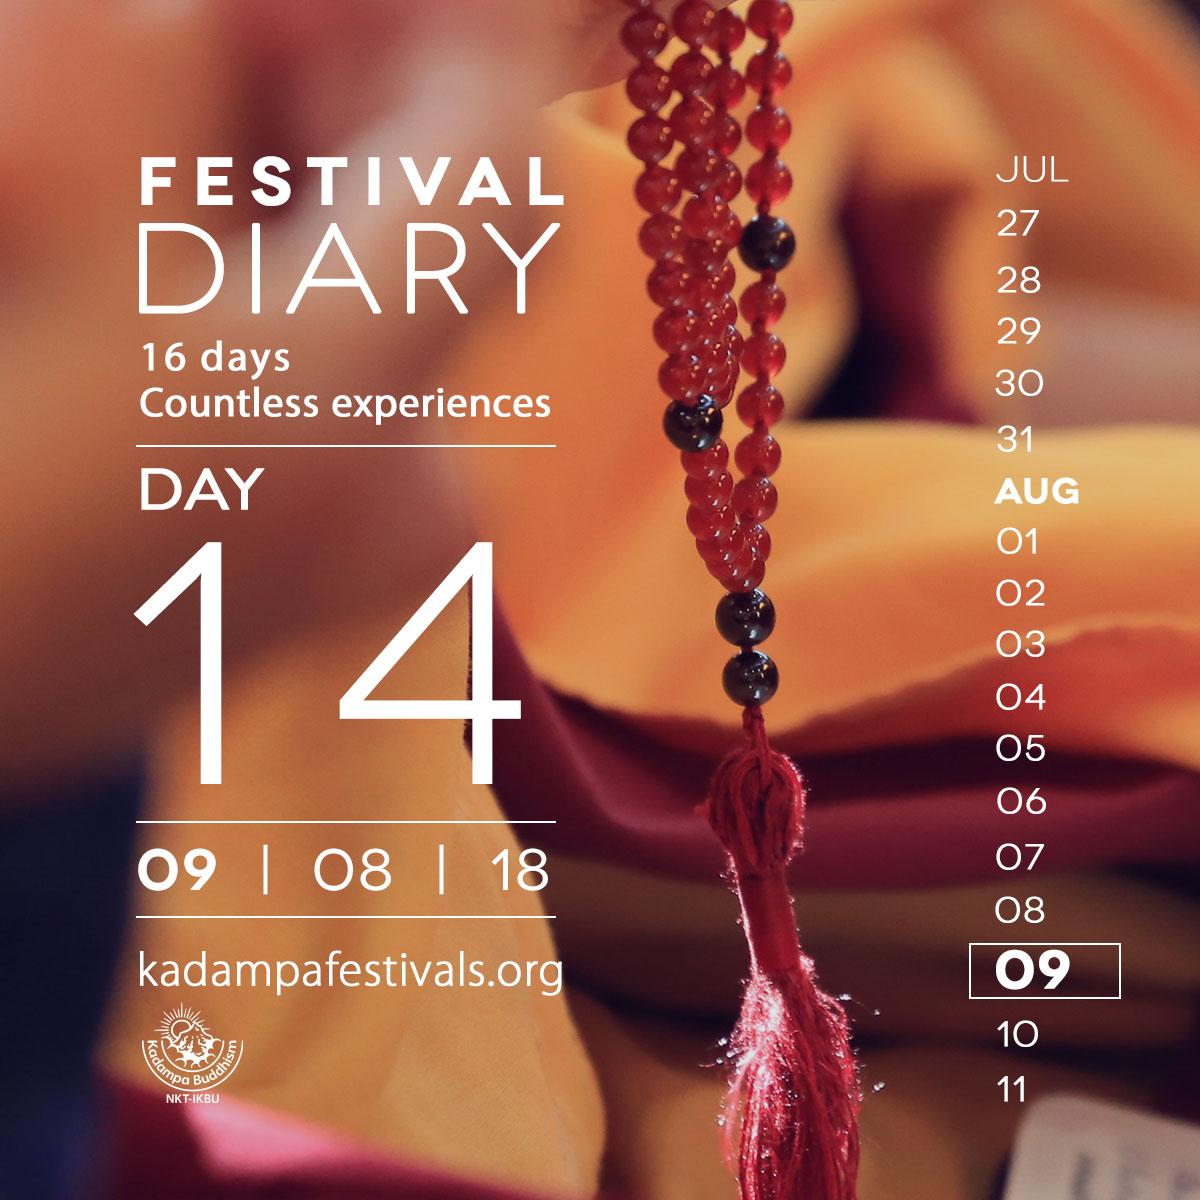 2018-07-26-festival diary-14-m